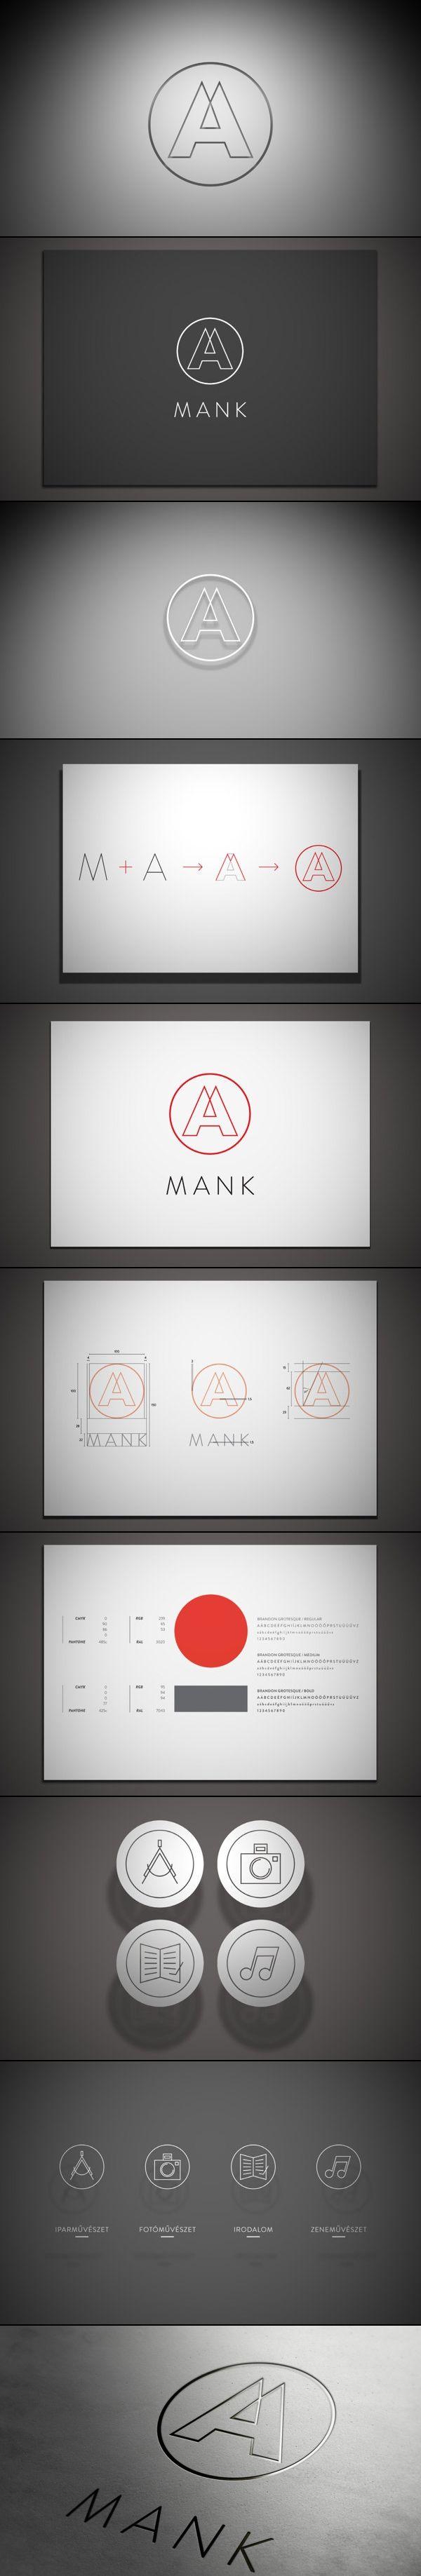 Mank Brand Identity